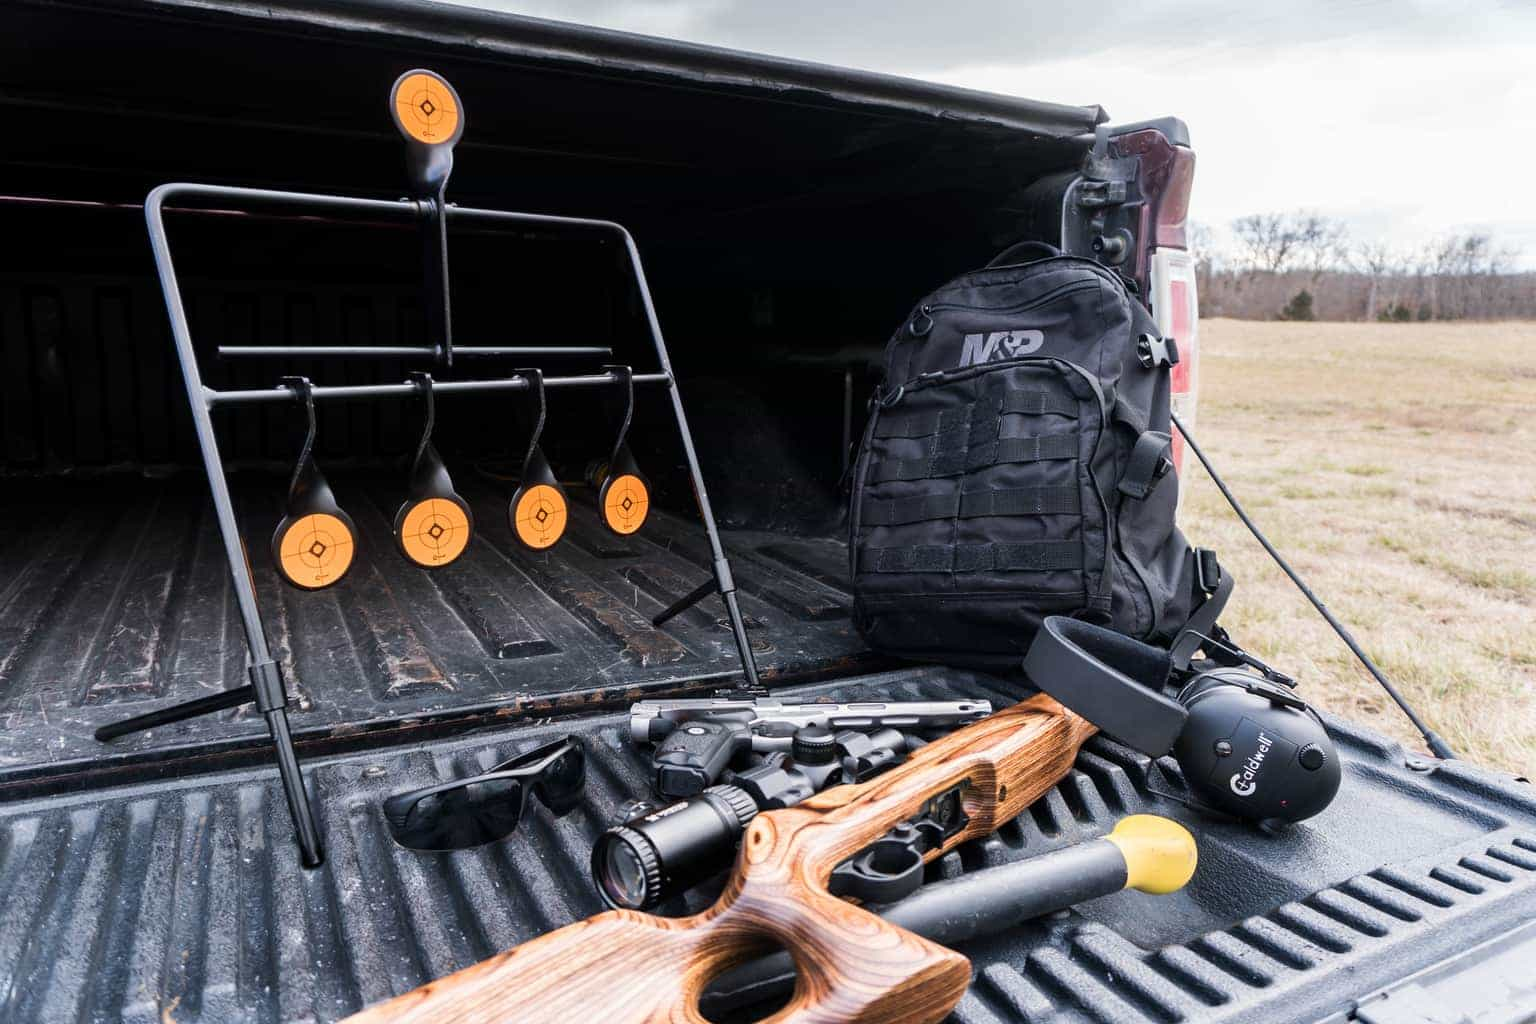 Rimfire Resetting Target - 902365 Still Life Truck Bed